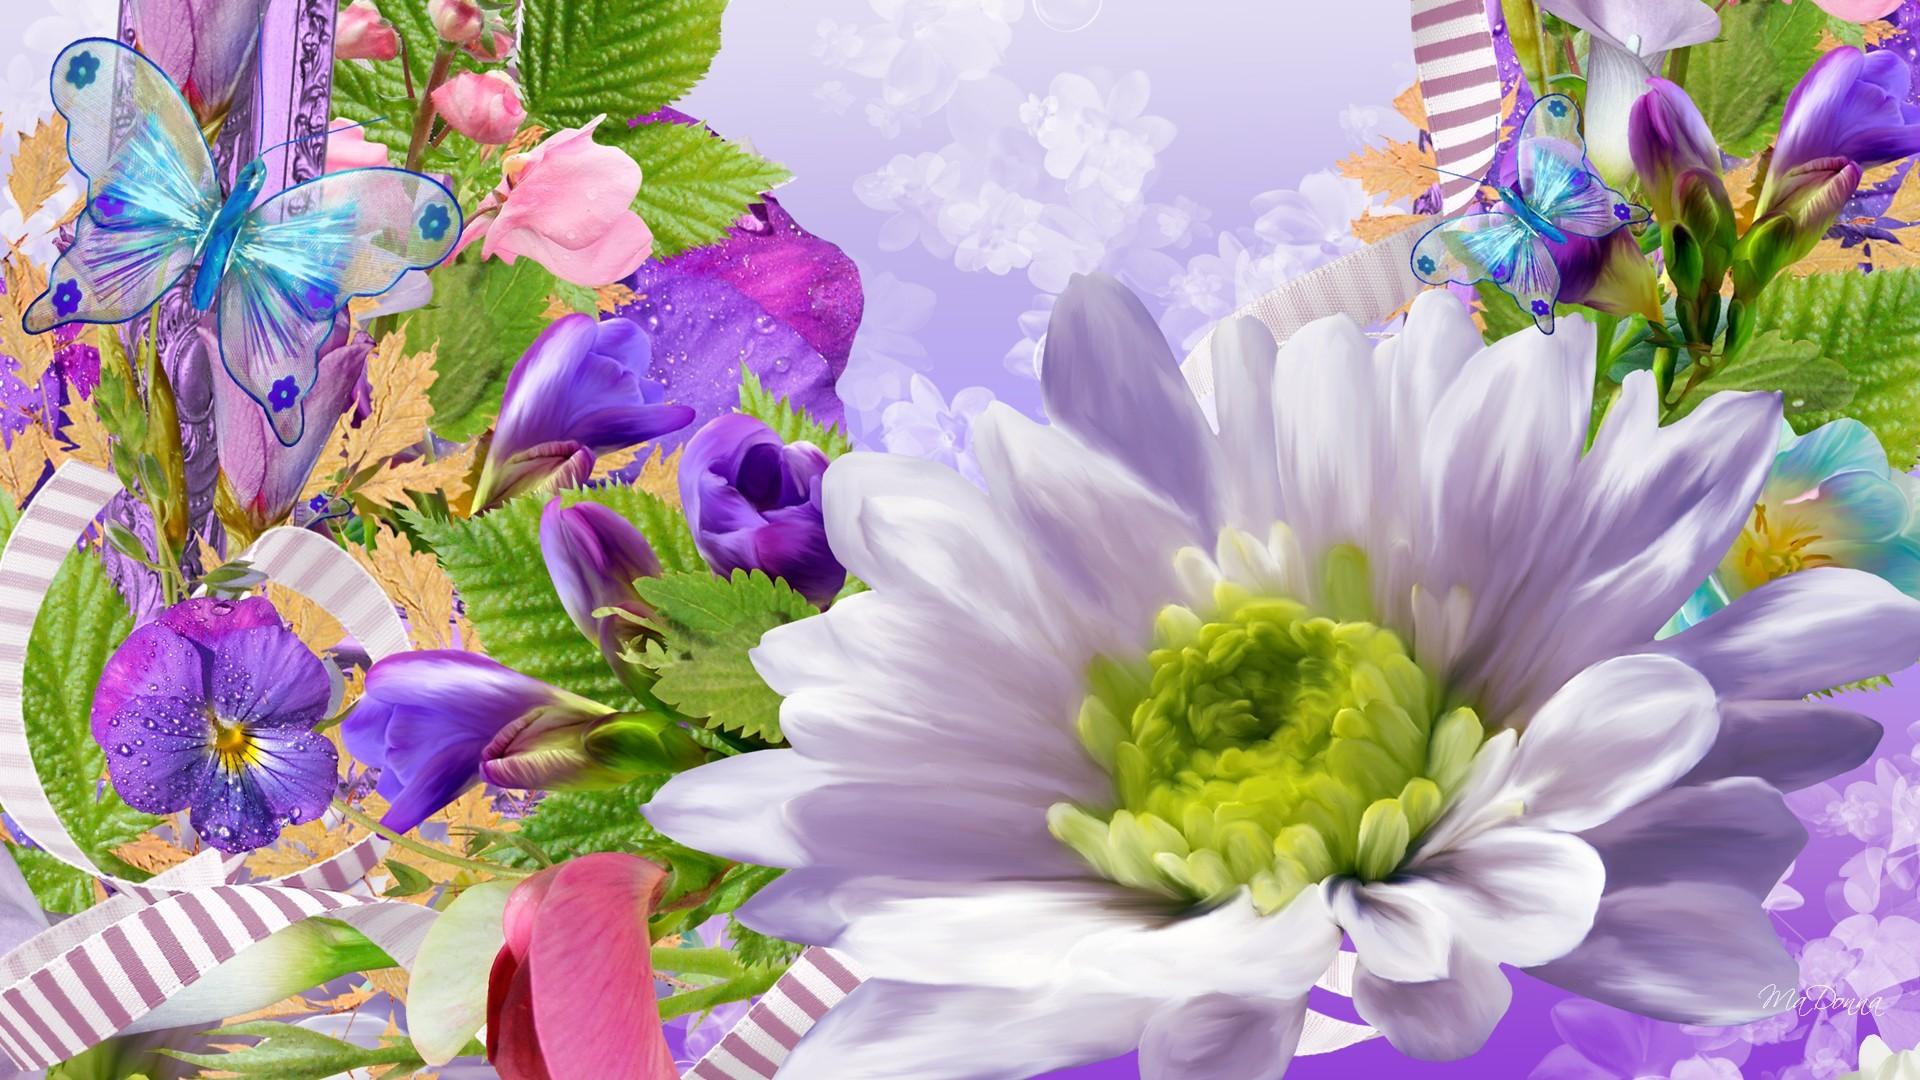 Res: 1920x1080, flower-wallpaper-for-desktop-background-hd-8 – Best Web